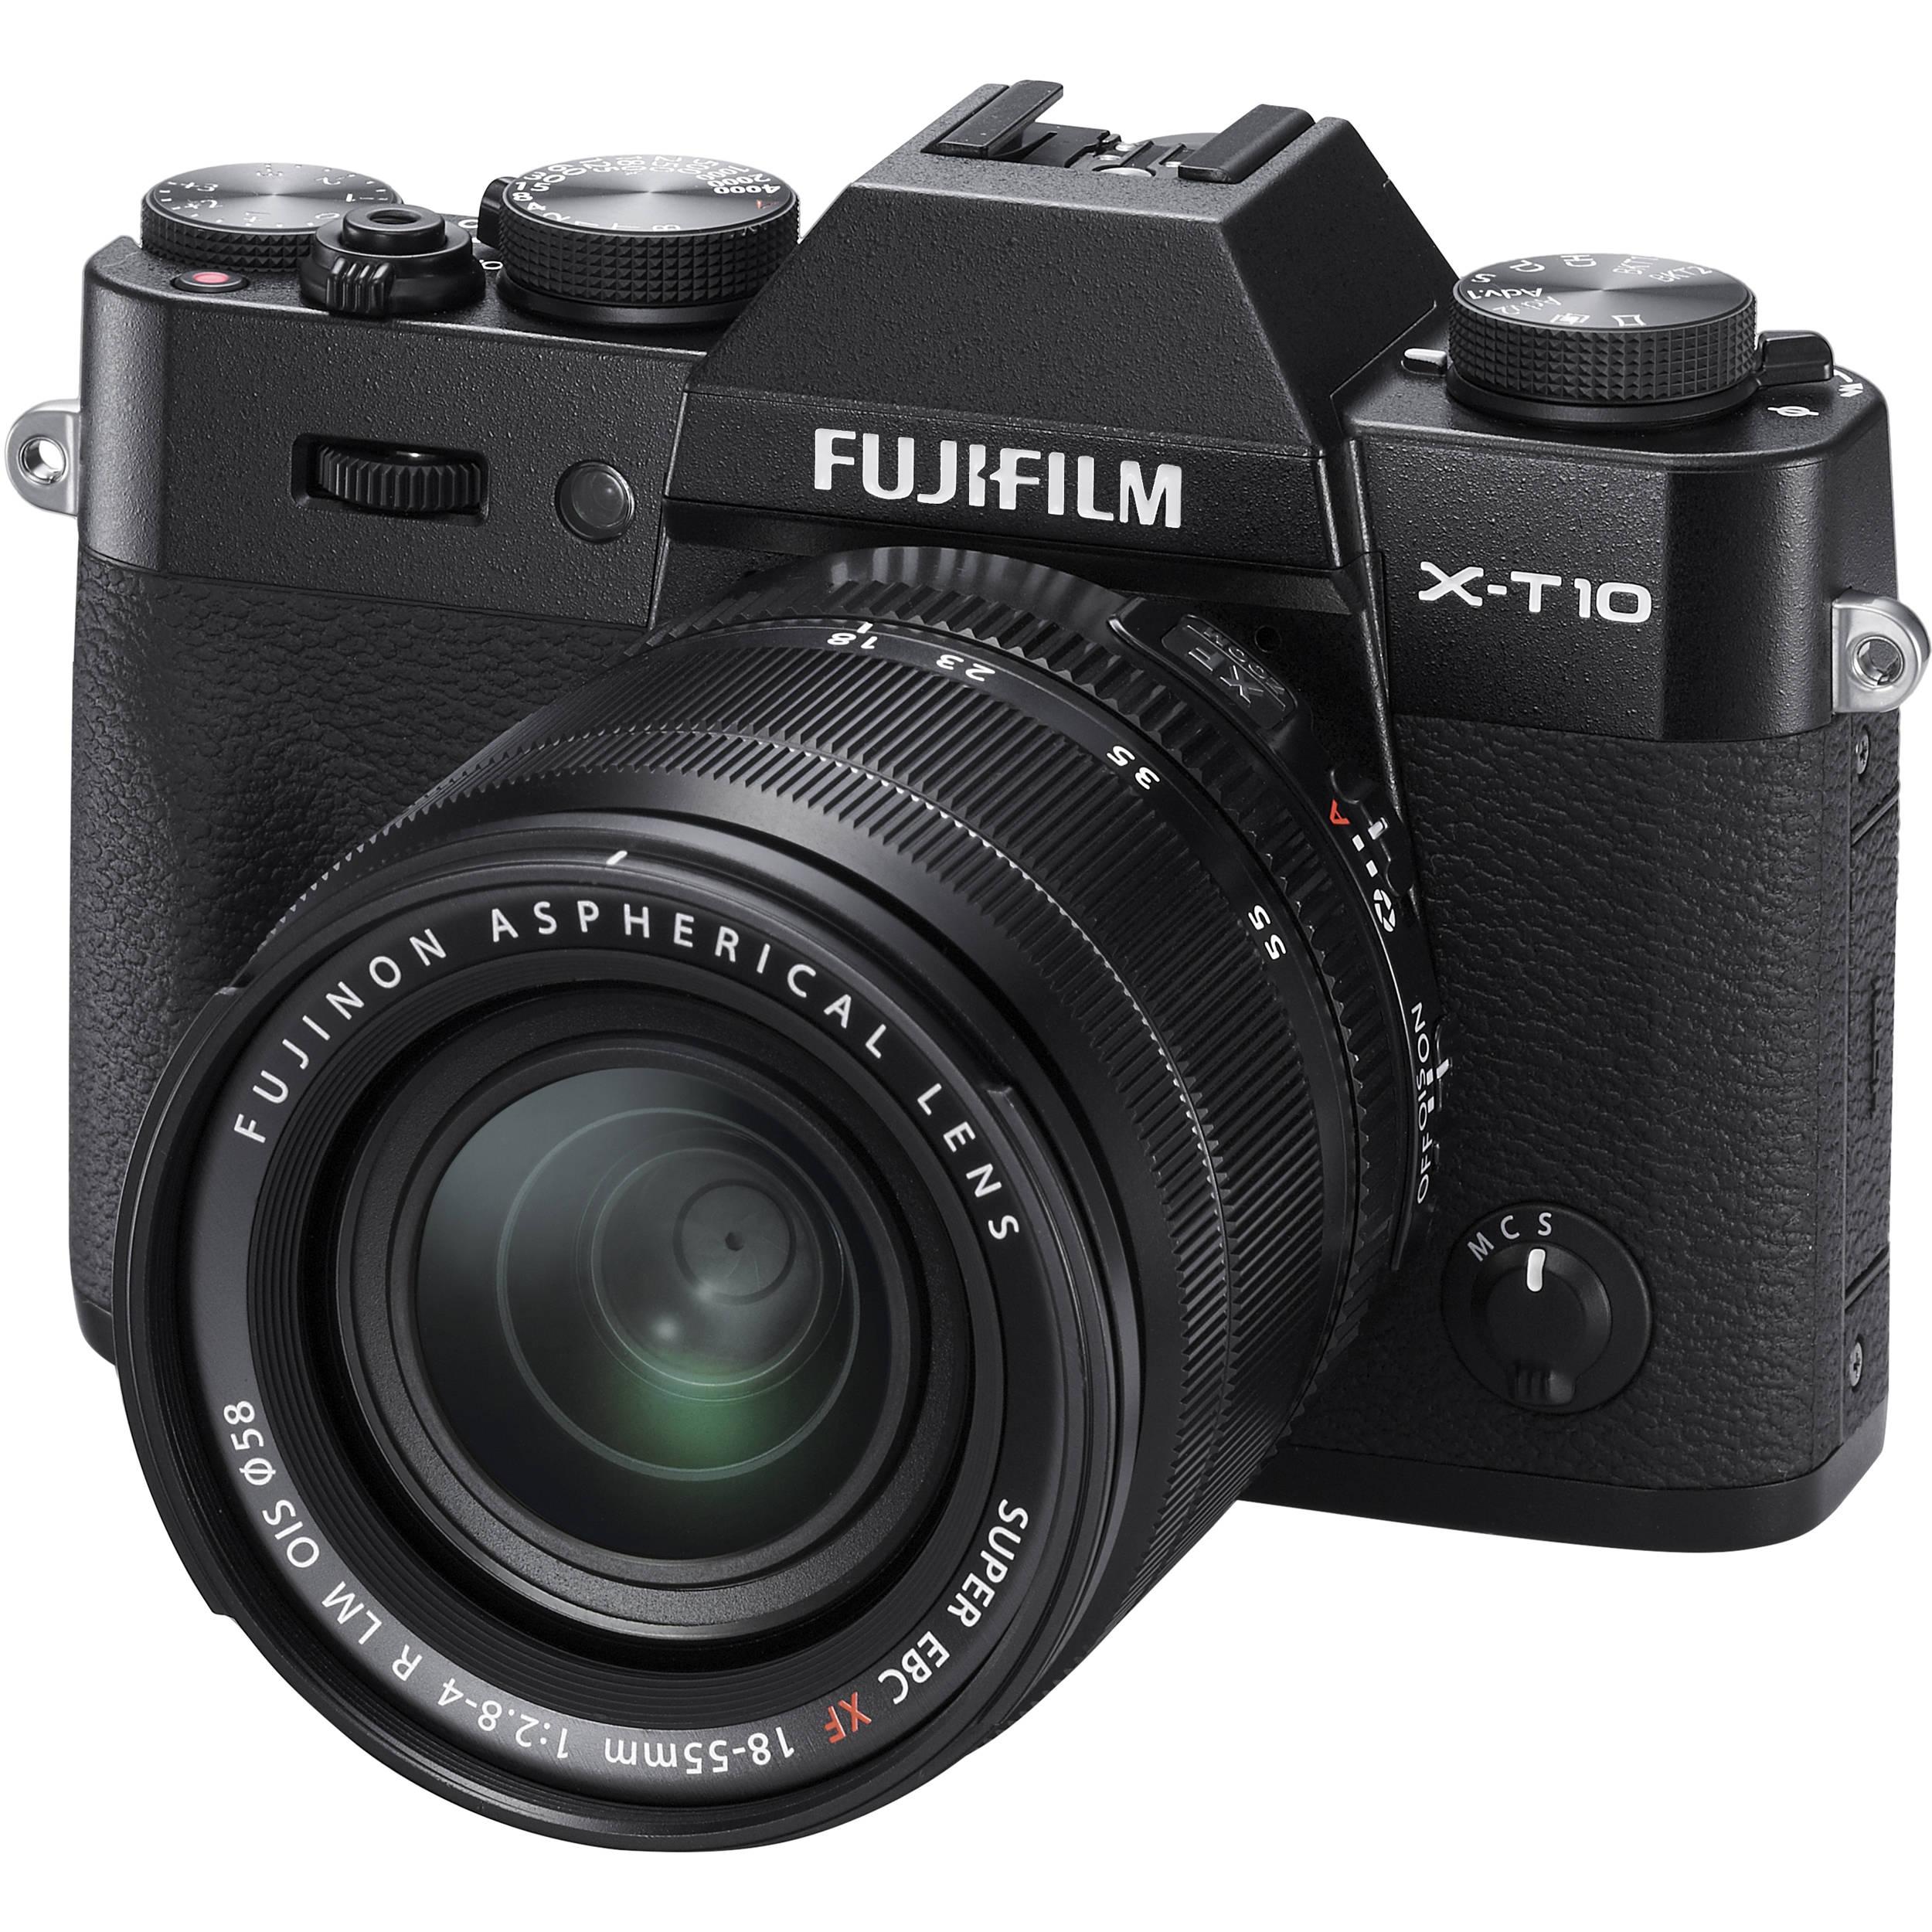 Fuji X-T1 18-135mm